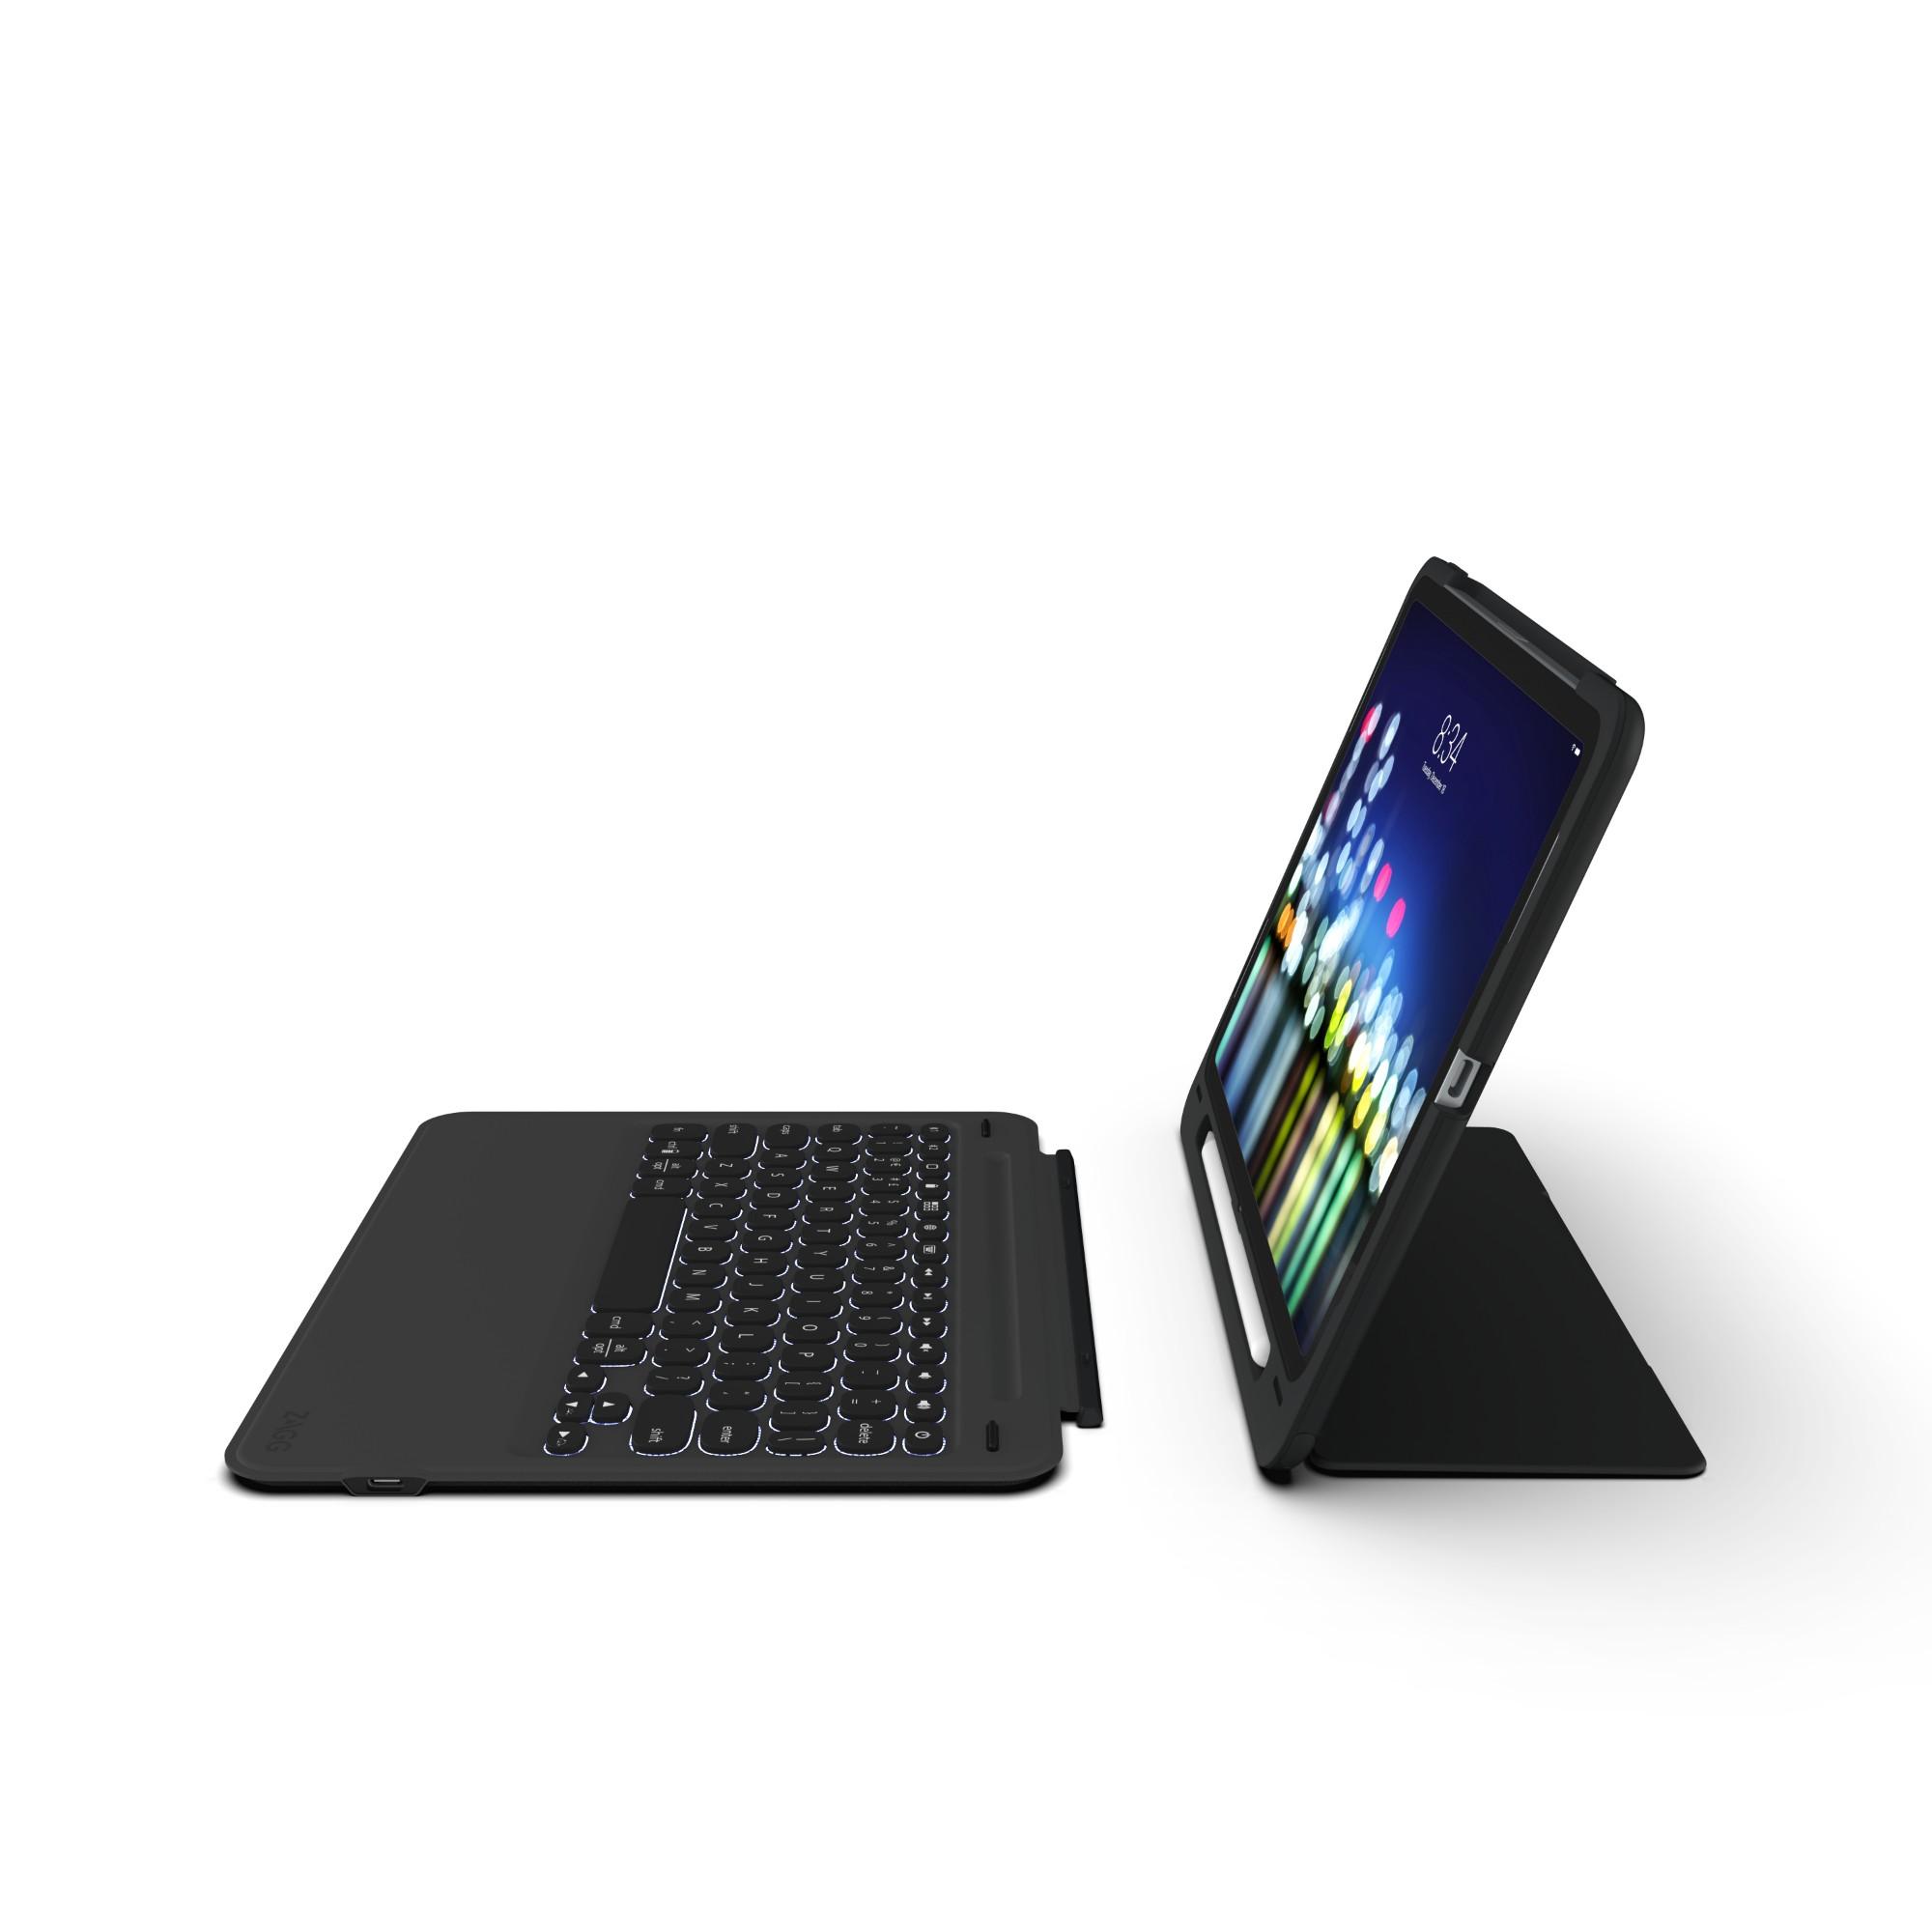 ZAGG Slim Book Go mobile device keyboard UK International Black Bluetooth